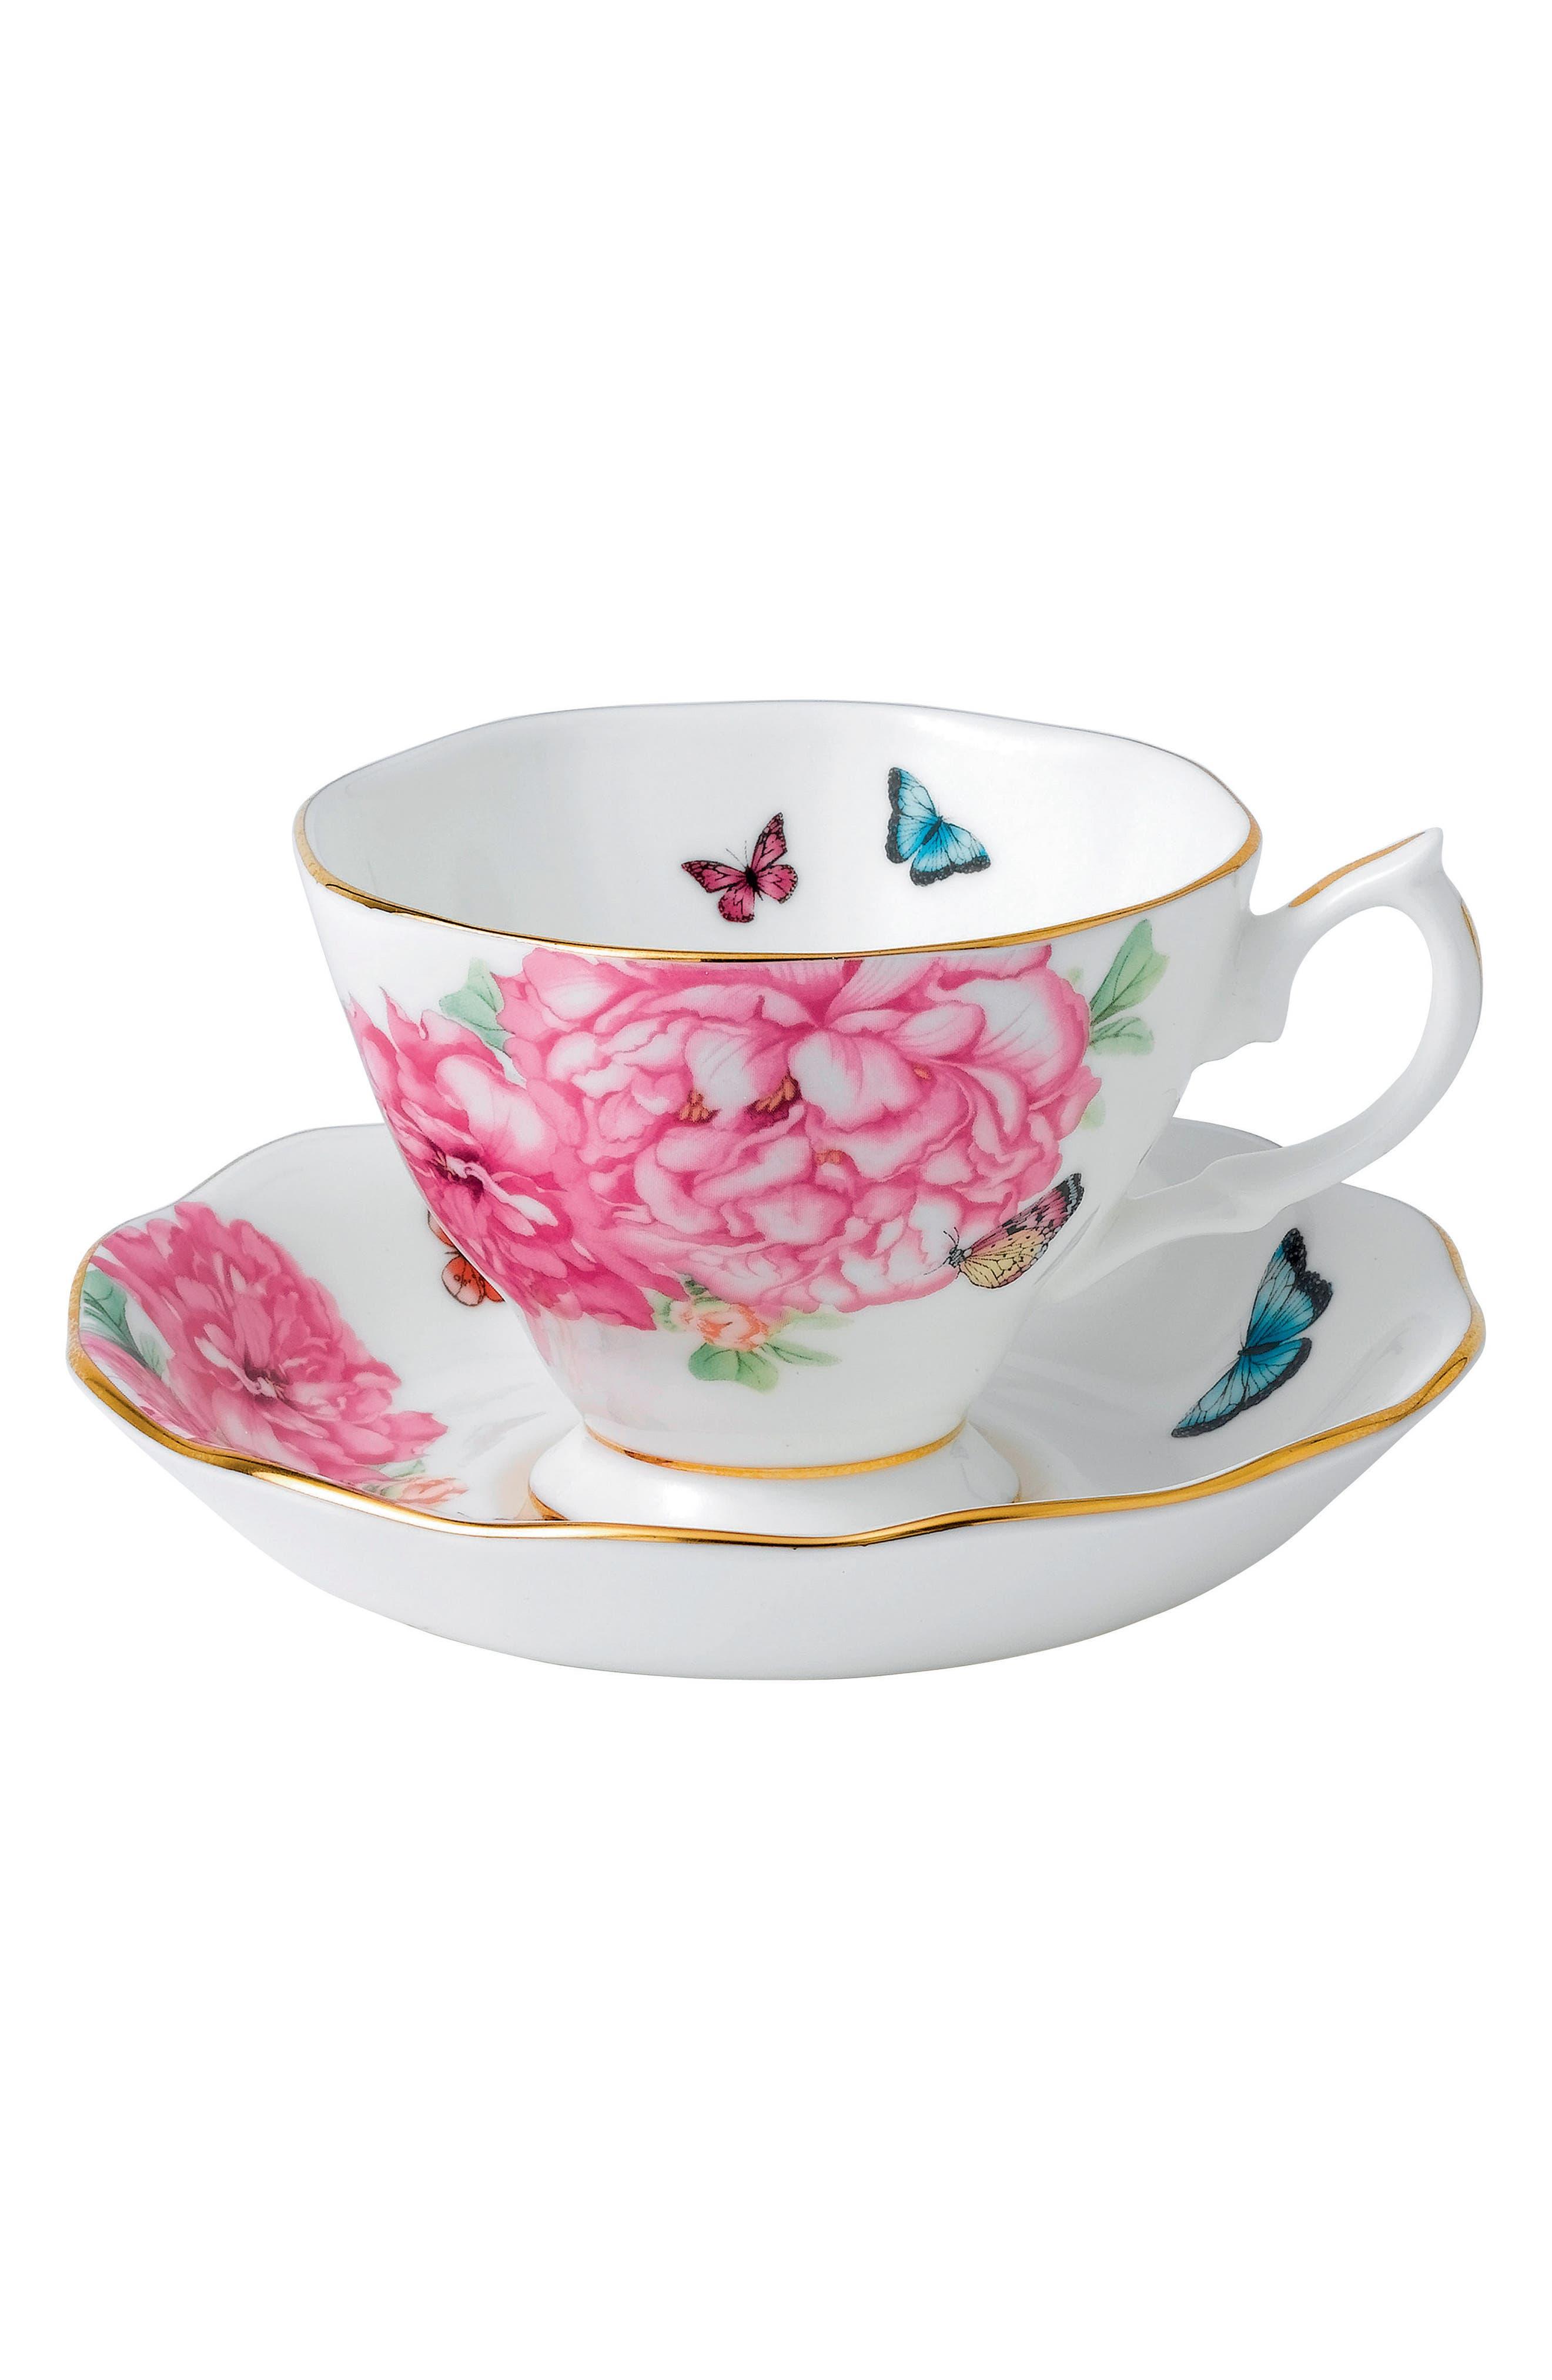 Main Image - Miranda Kerr for Royal Albert Friendship Teacup & Saucer